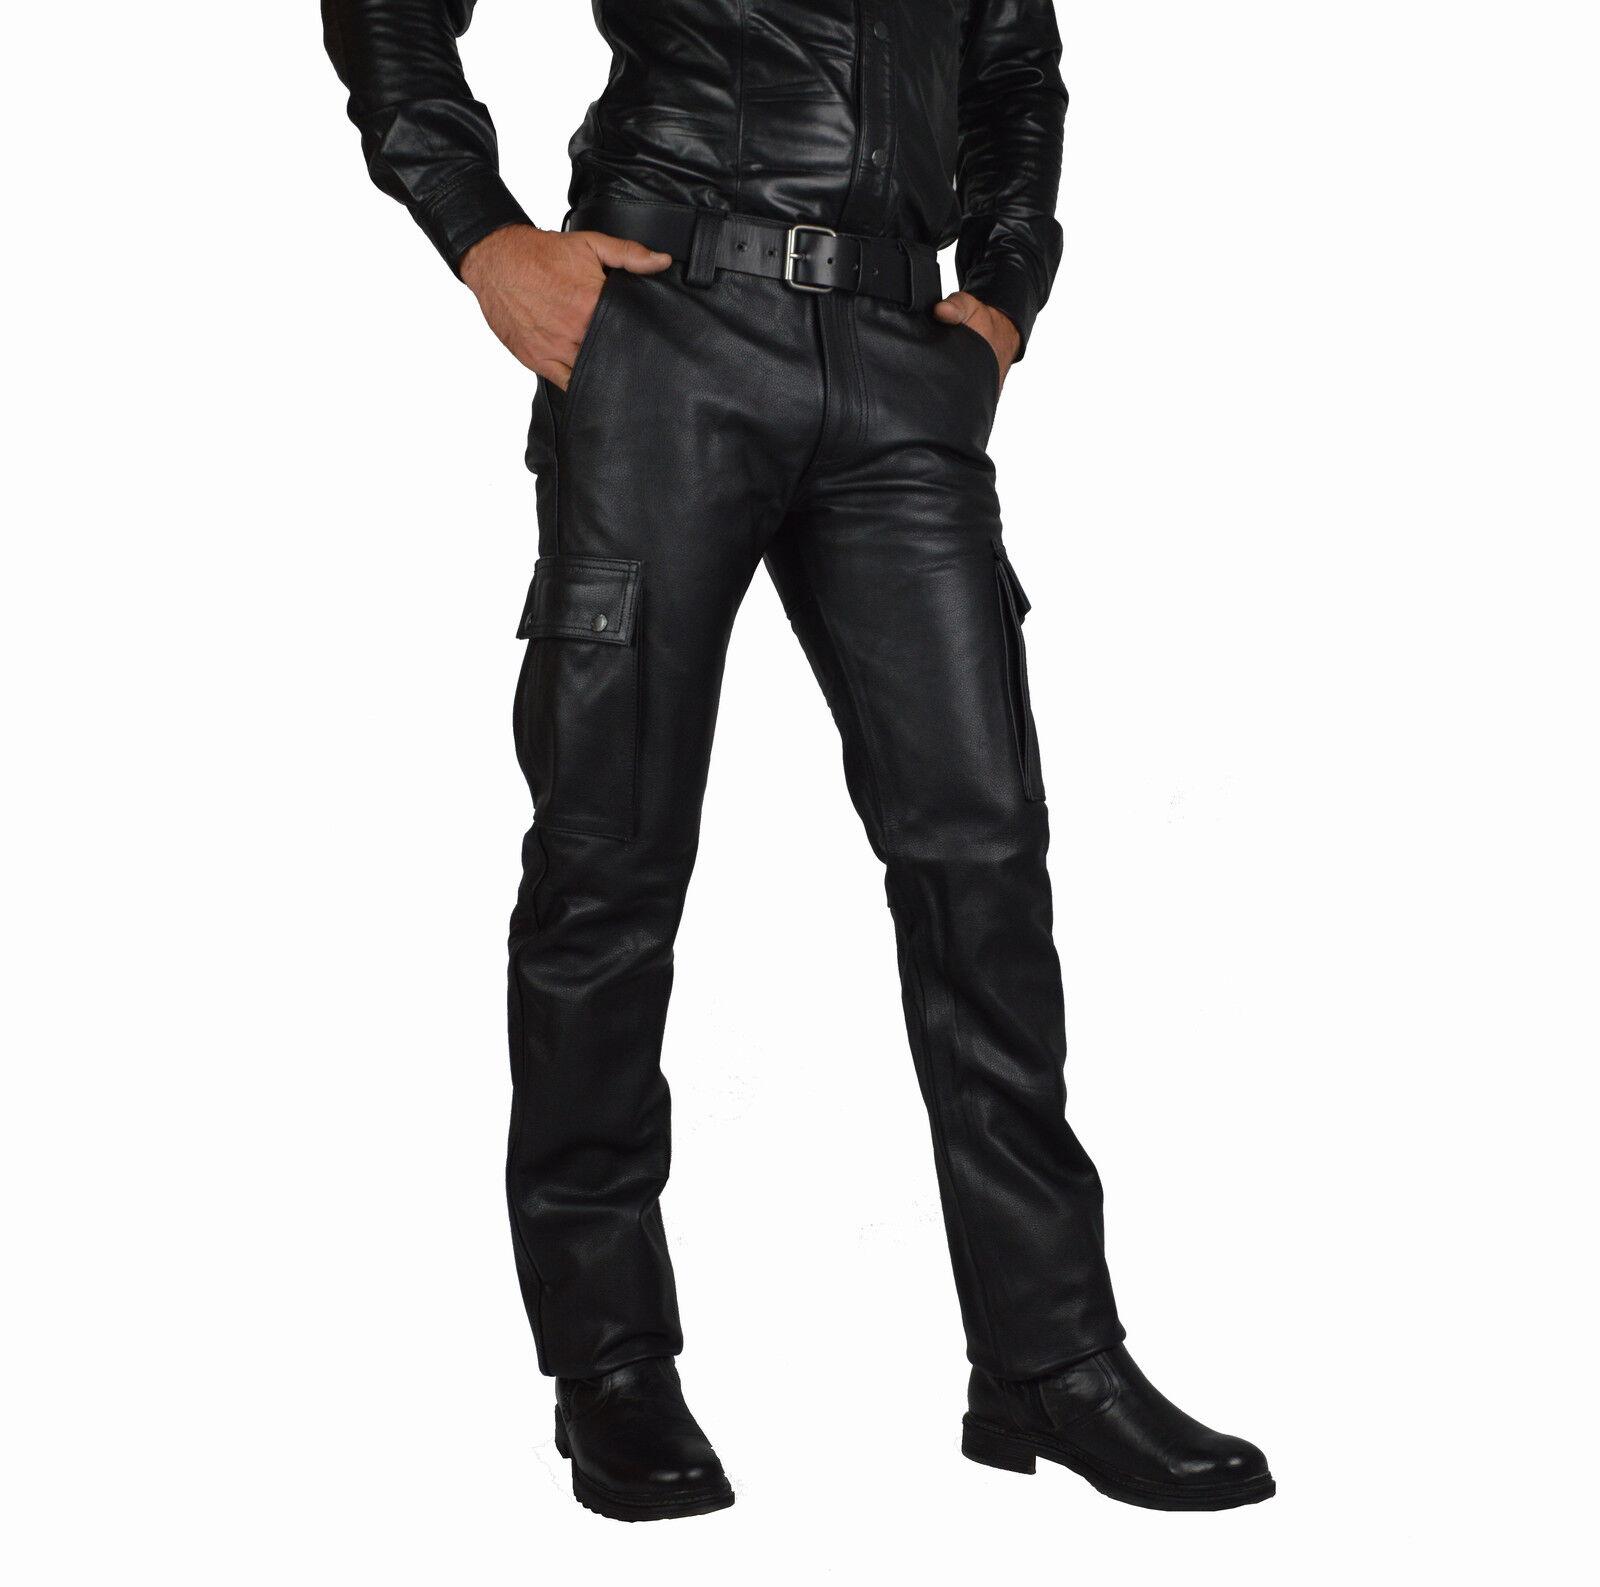 32 Waist  Cargo Lederhose,Combat Leather trousers,Rindleder cargohose,Leder hose